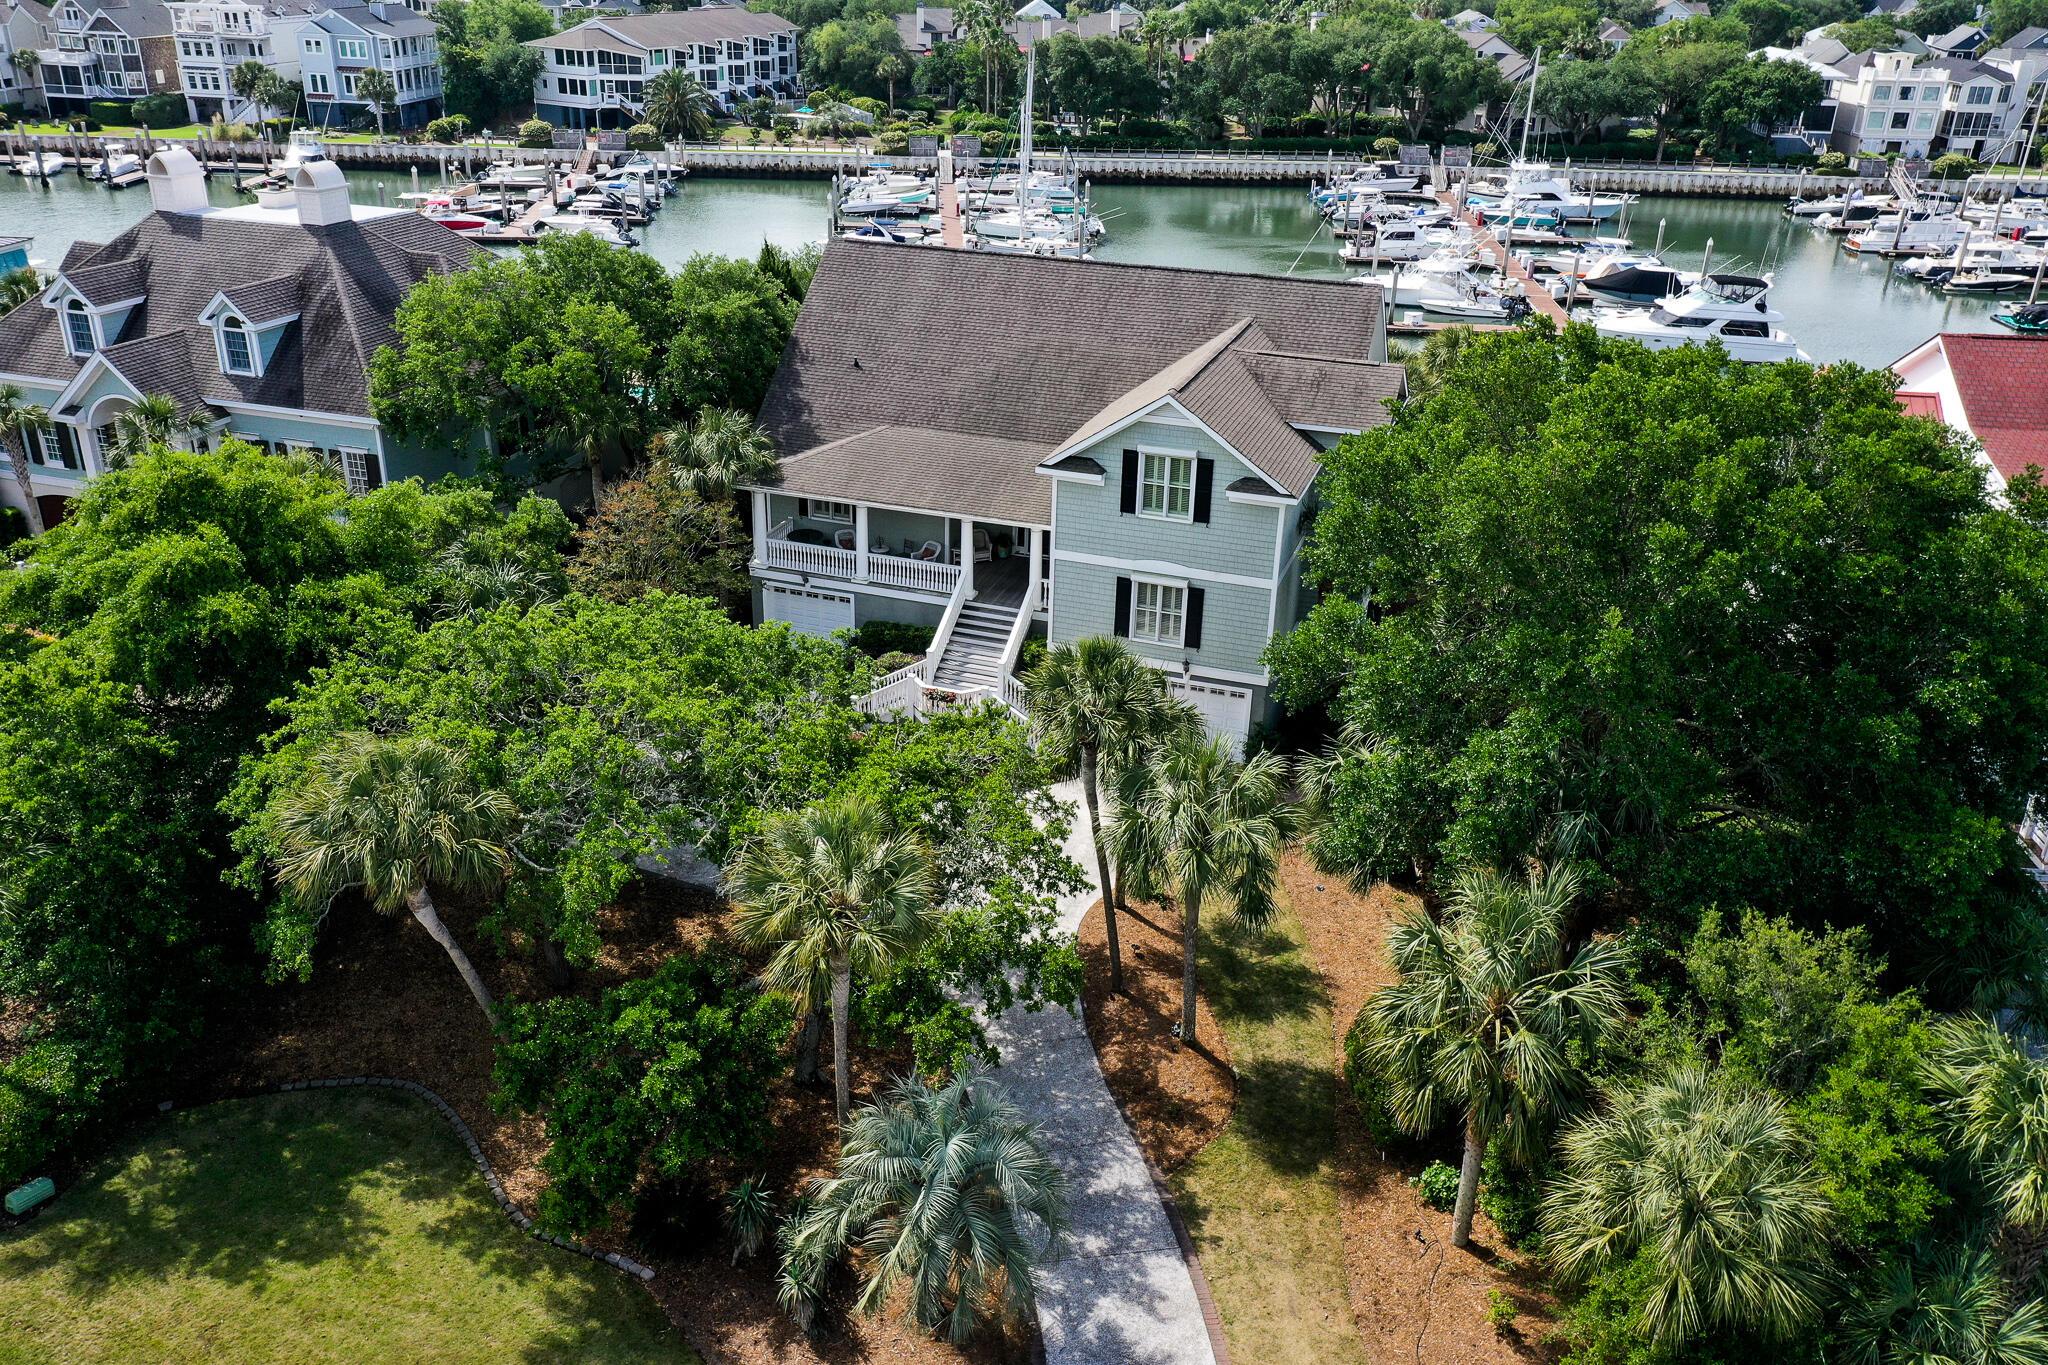 Waterway Island Homes For Sale - 42 Waterway Island Drive, Isle of Palms, SC - 1